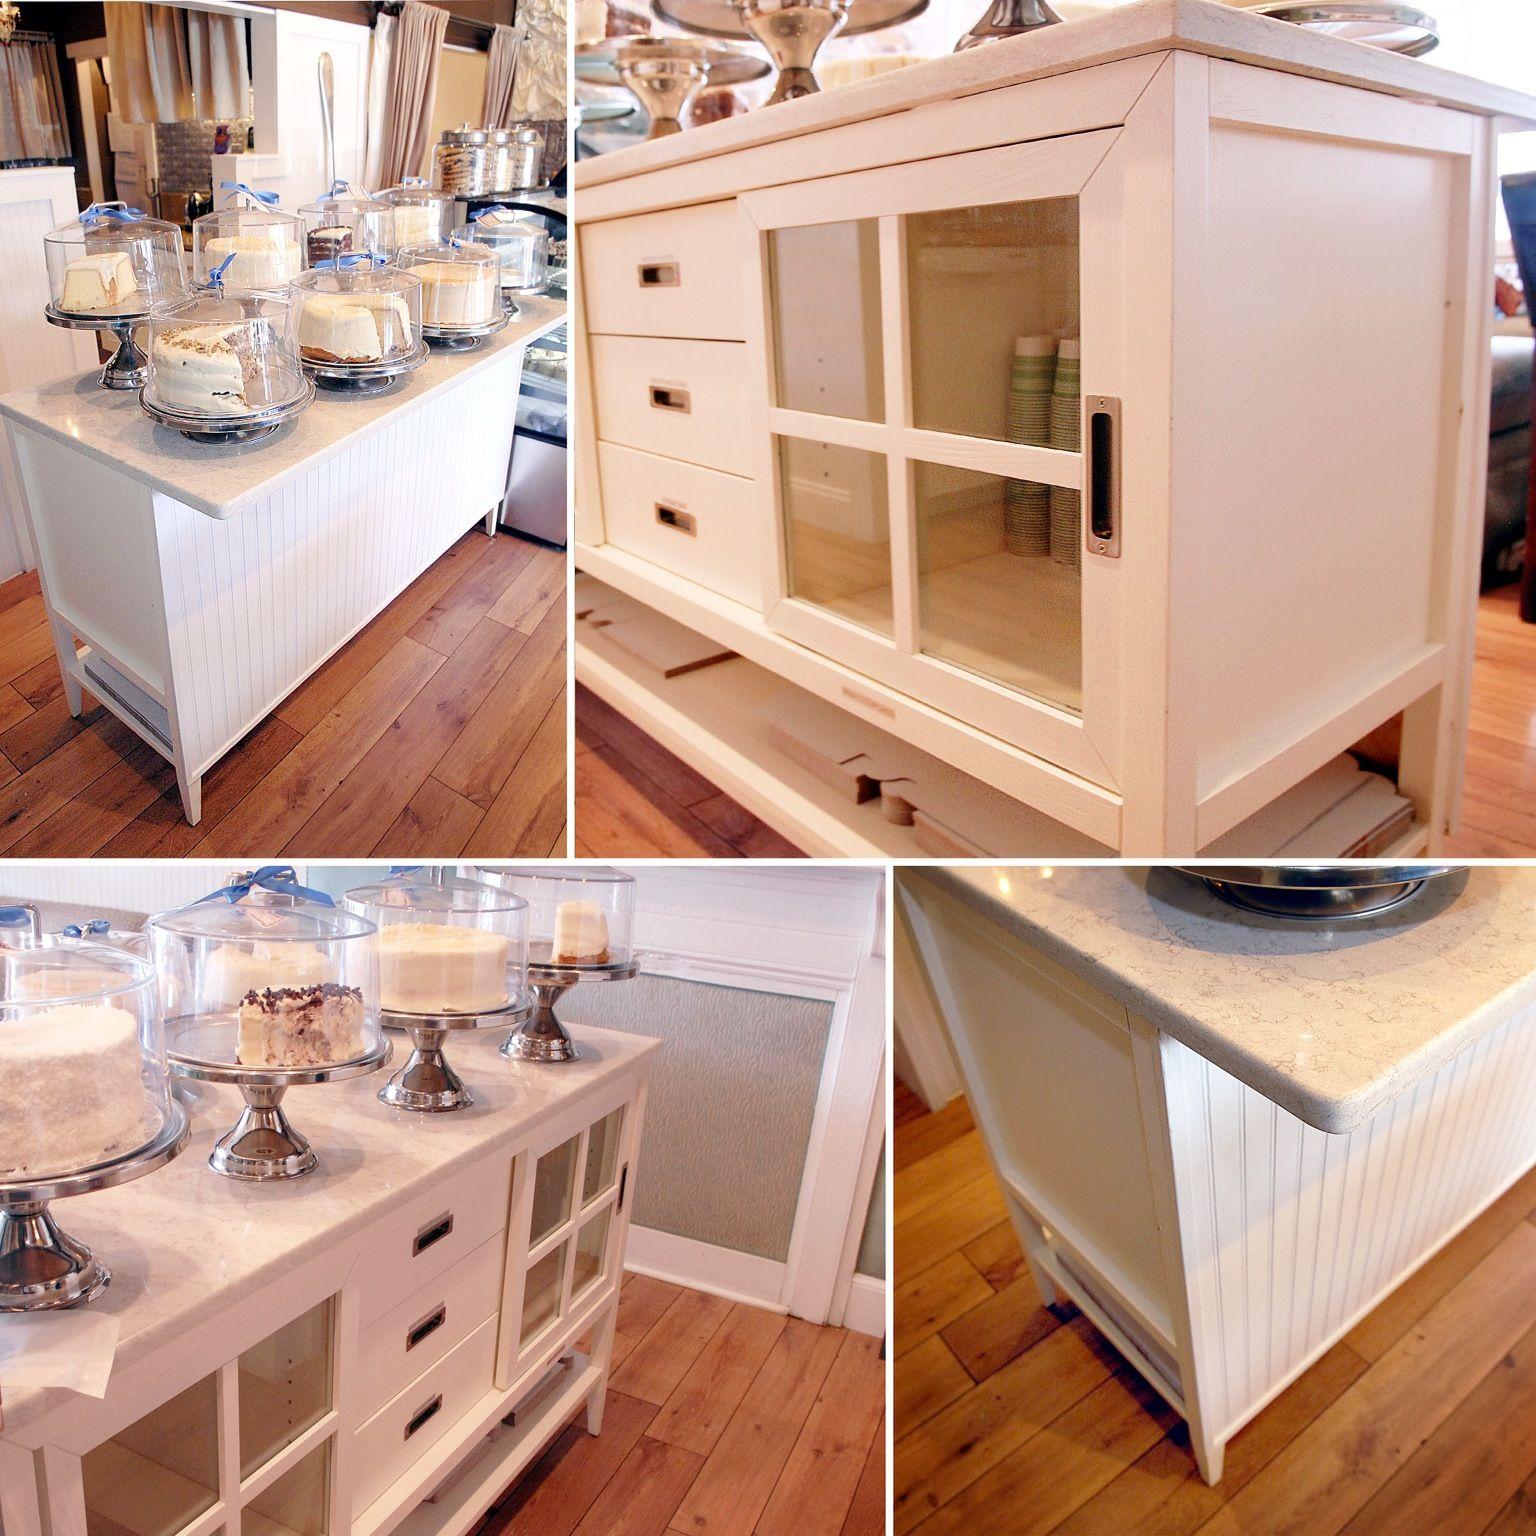 Cambria Waverton Quartz Countertops At The Delicious Maxie B's Stunning Bathroom Remodeling Greensboro Nc Inspiration Design